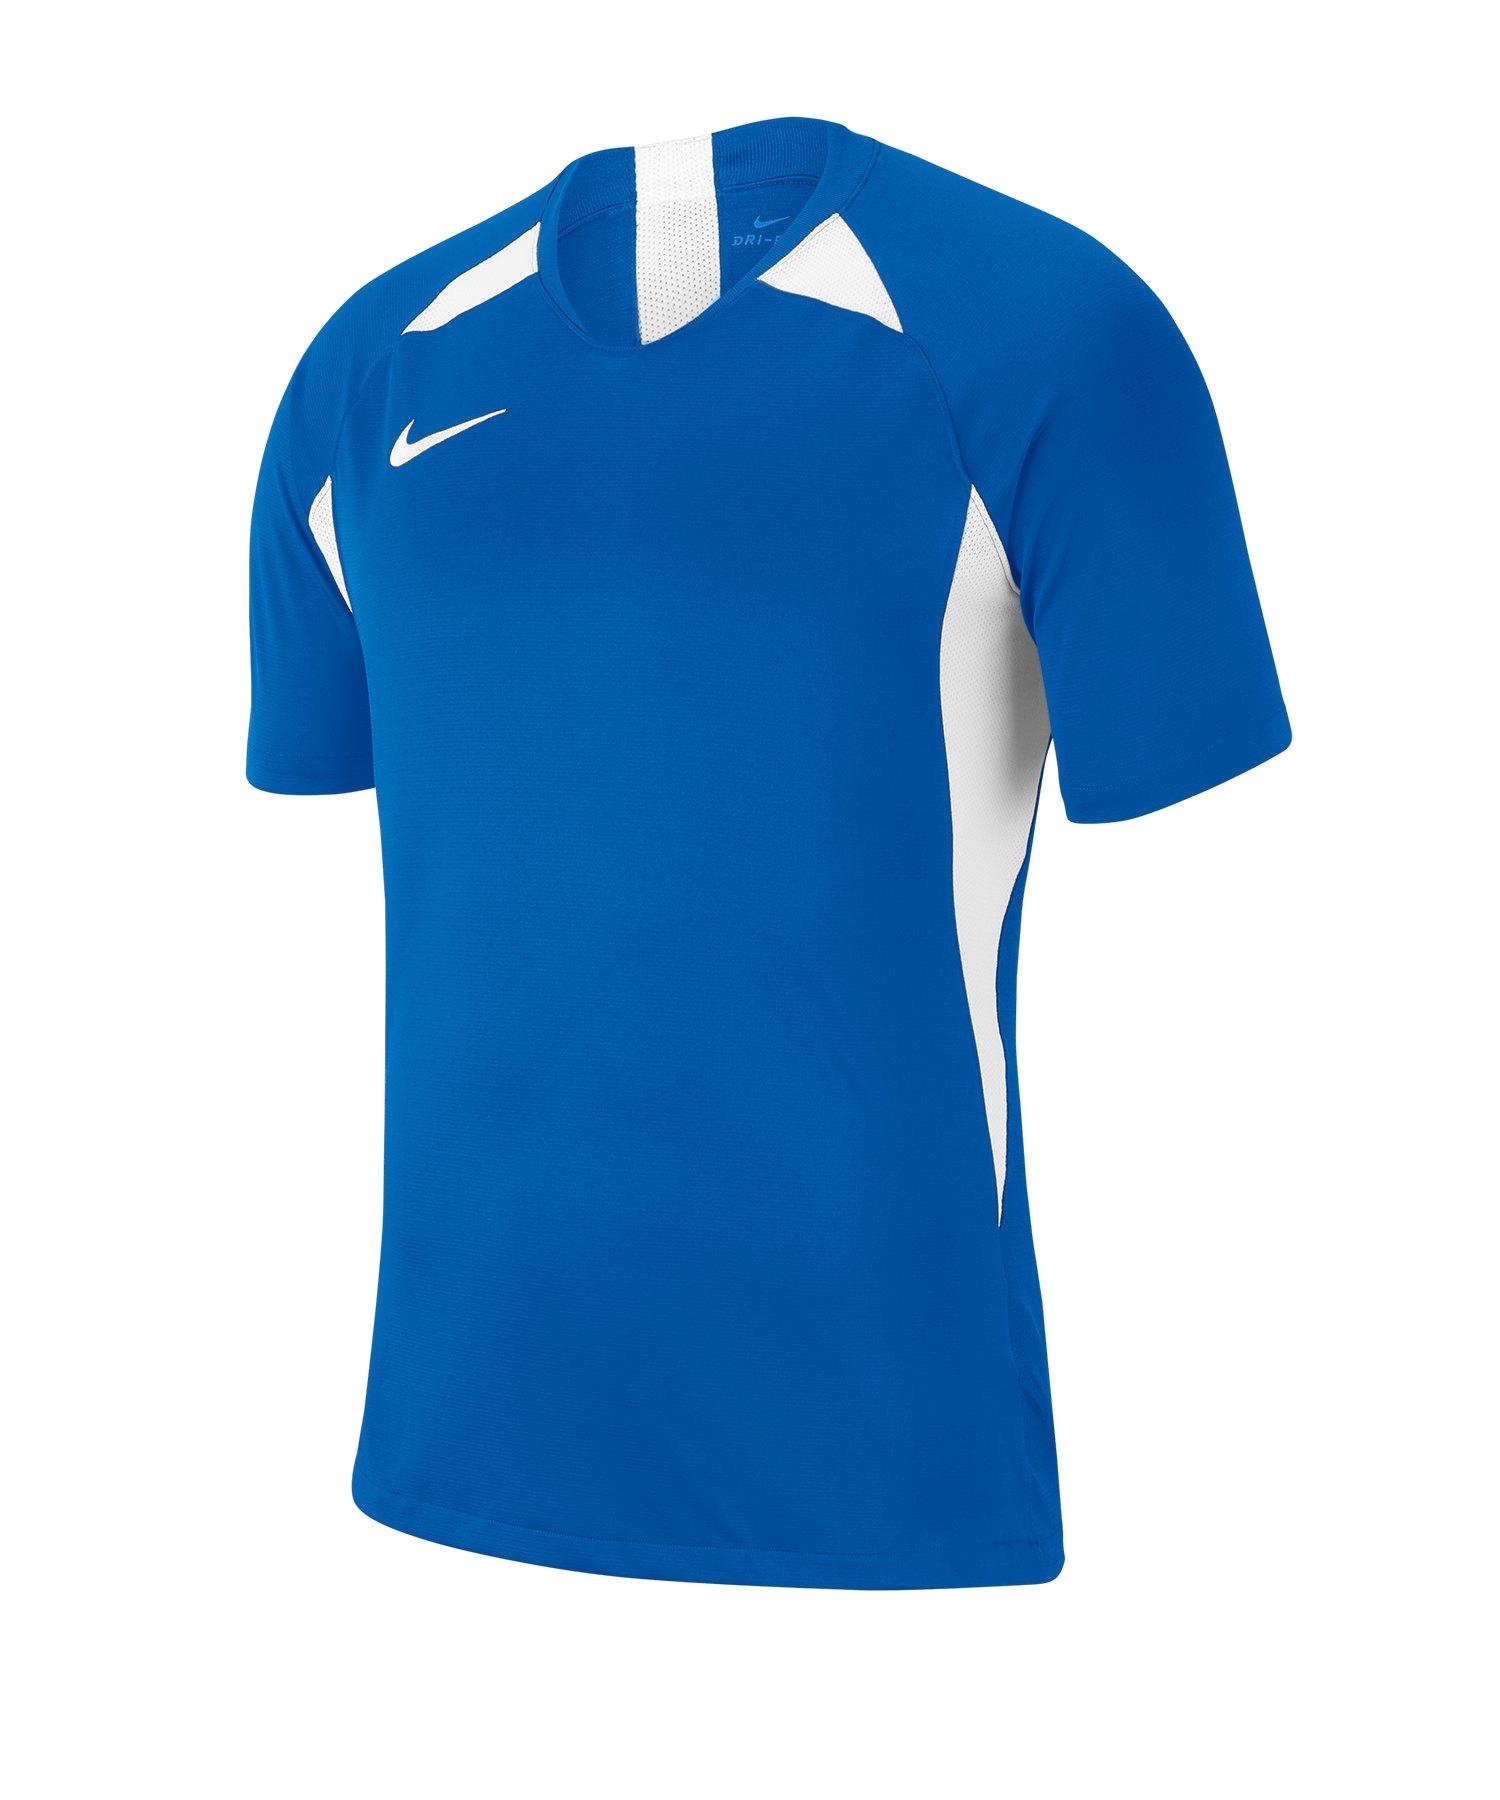 Nike Legend Trikot kurzarm Blau F463 - blau